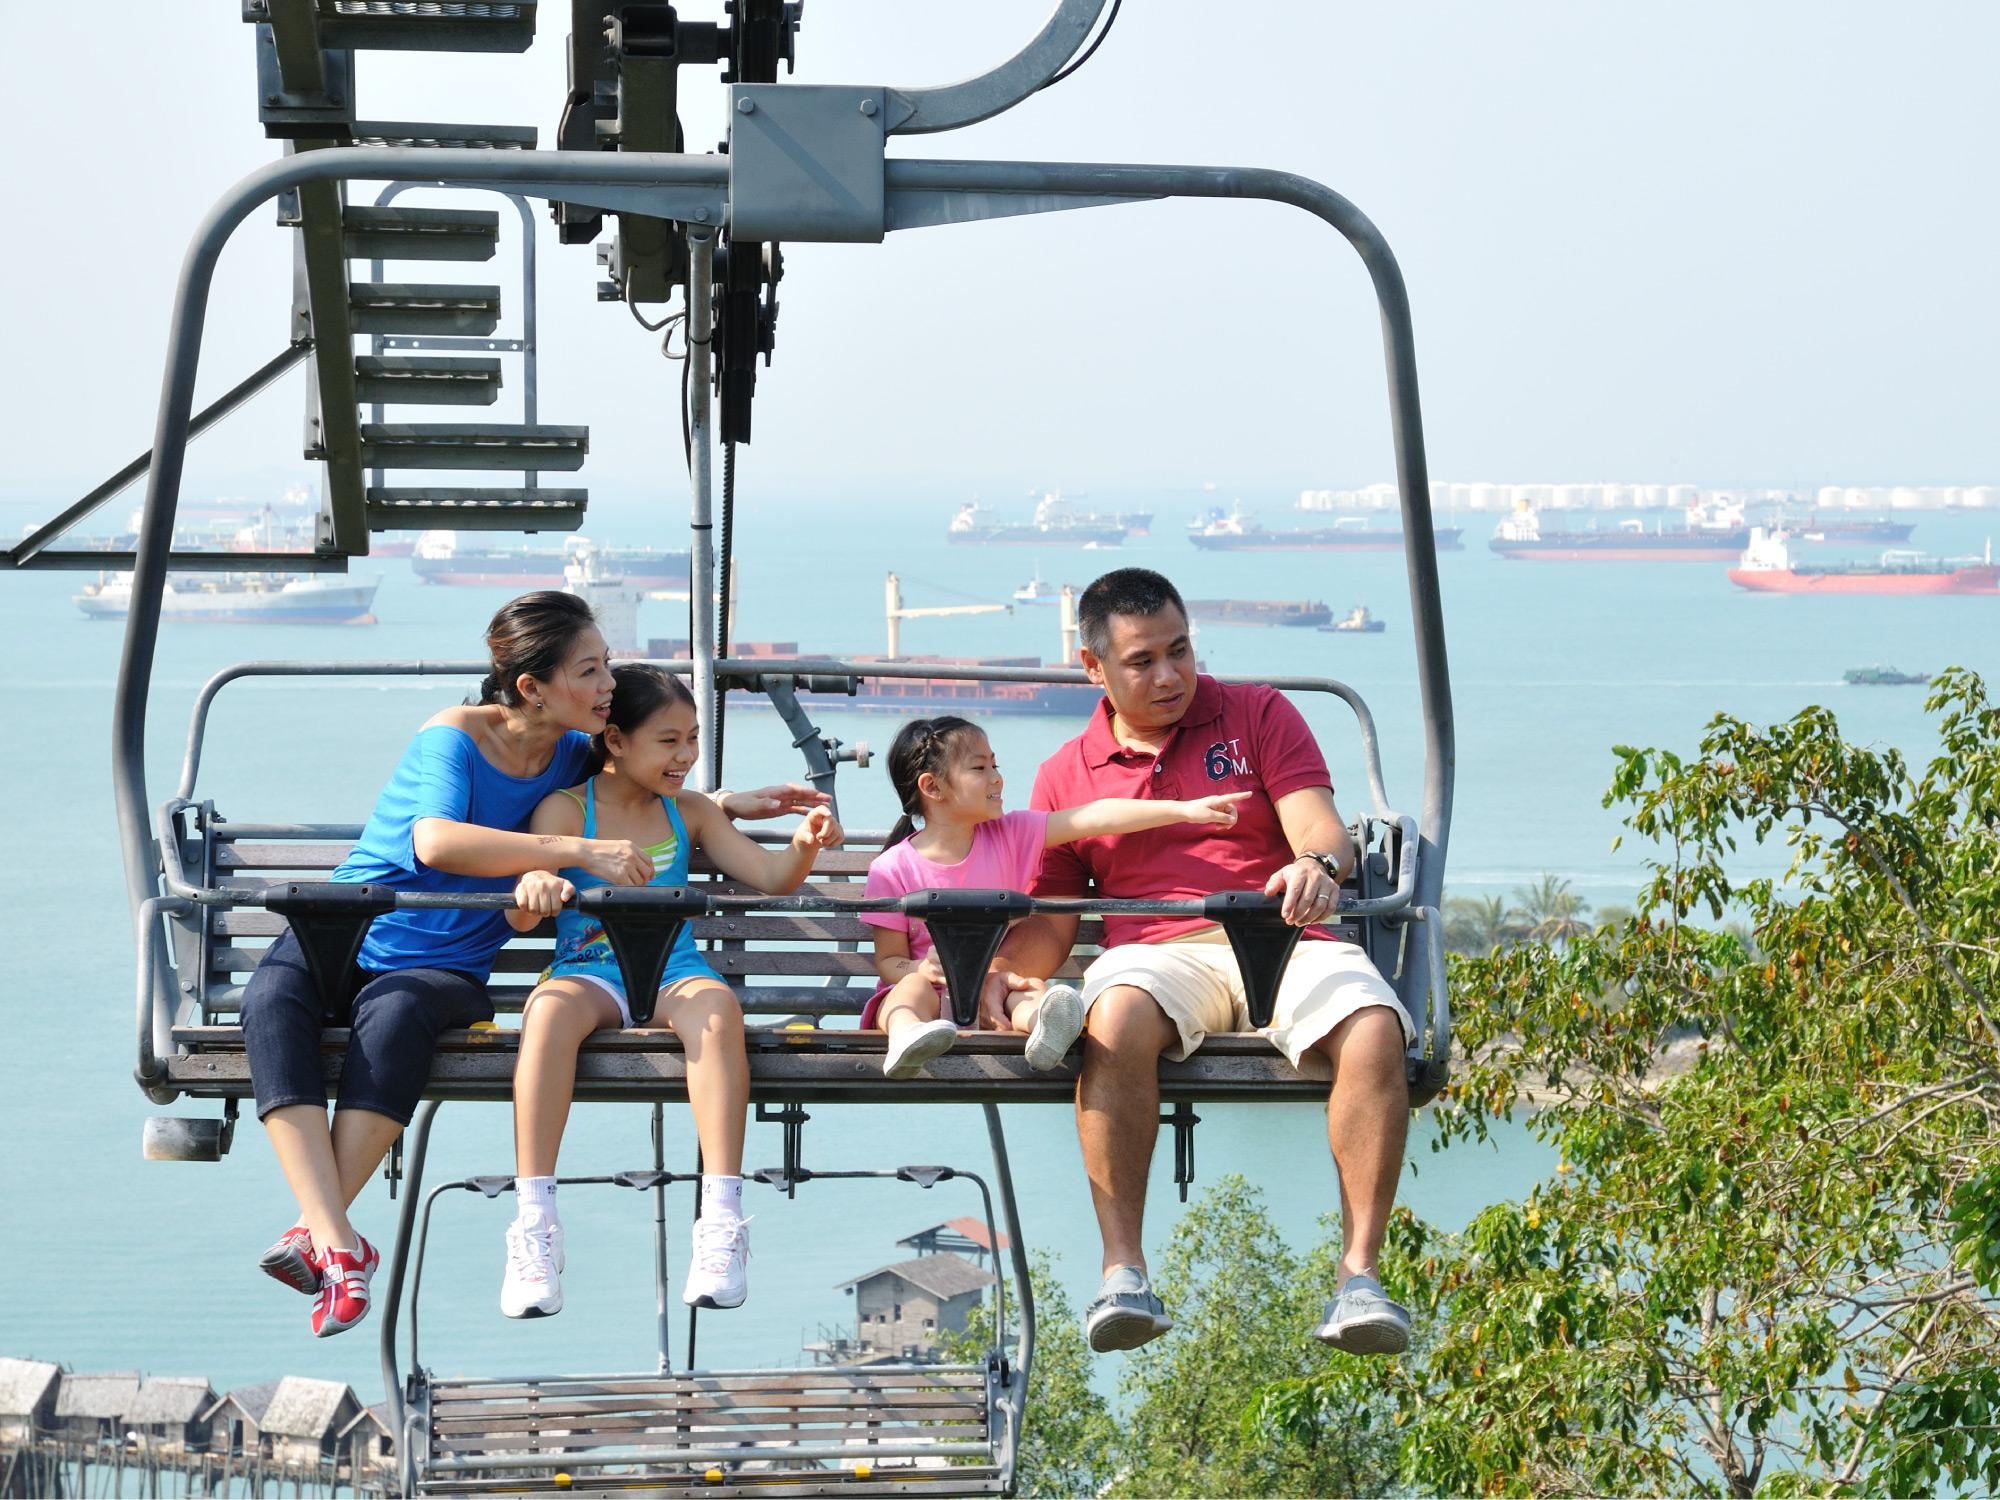 Skyline Luge Sentosa The Traveller Ampamp Singapore 2x